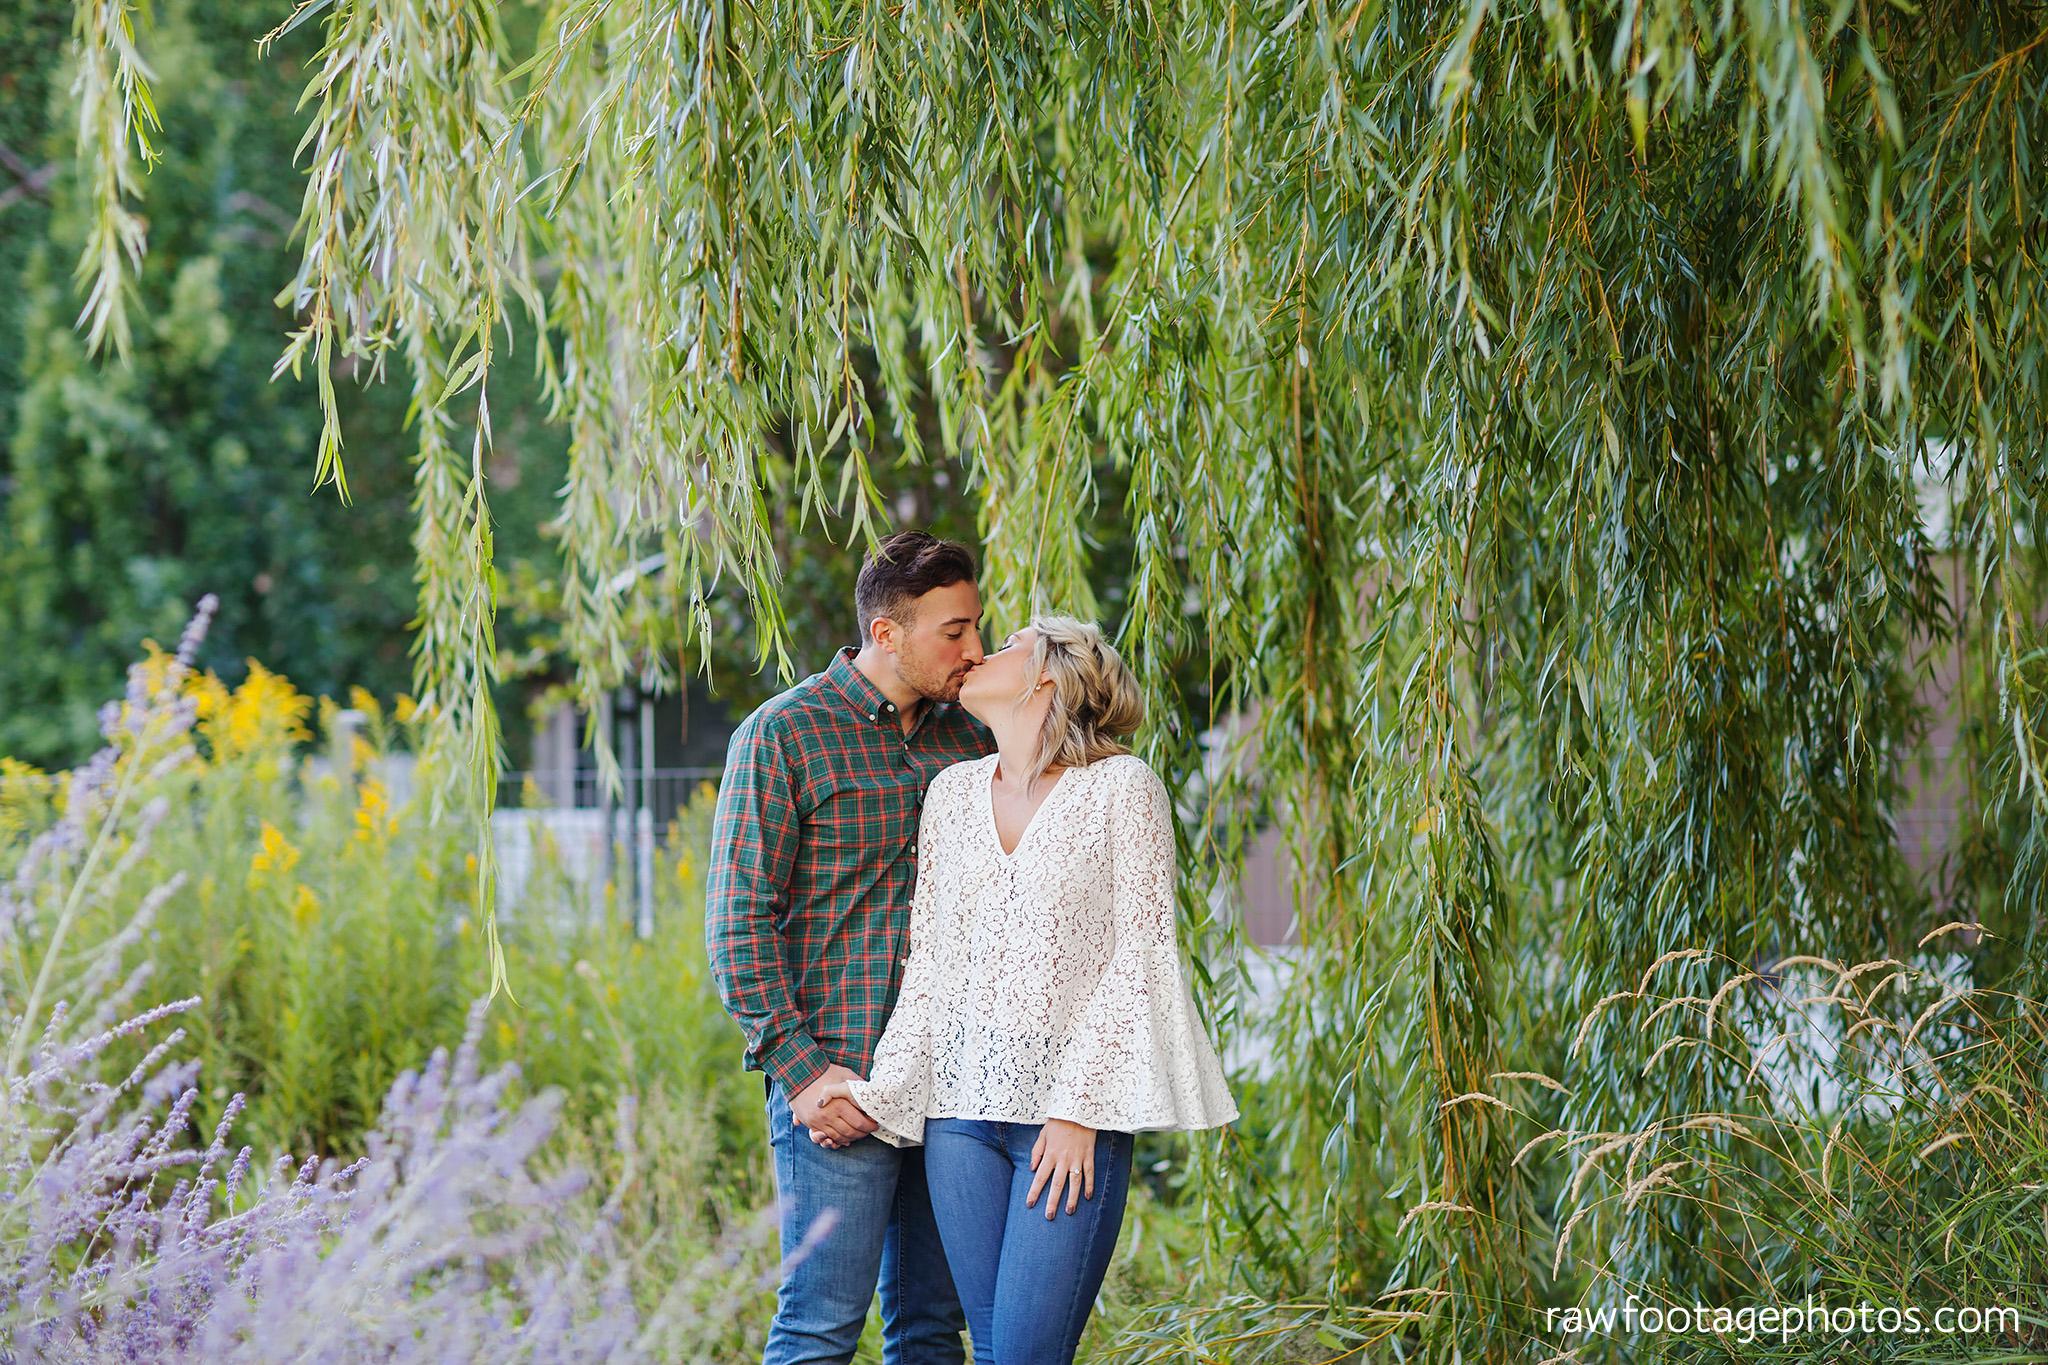 london_ontario_wedding_photographer-raw_footage_photography-engagement_session-uwo-campus-gibbons_park-woods010.jpg